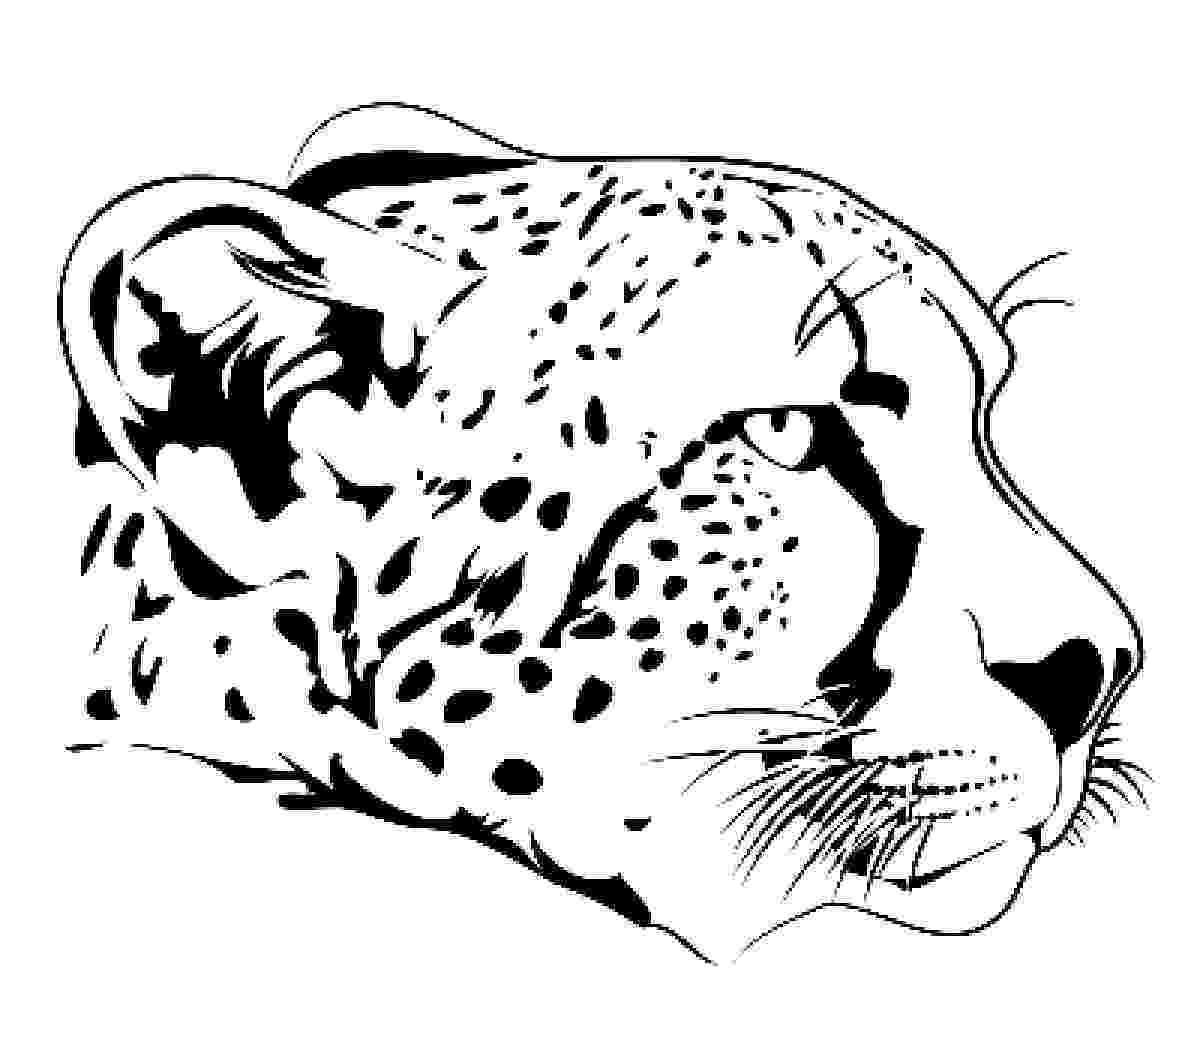 cheetah coloring page cheetah coloring pages 360coloringpages page cheetah coloring 1 1